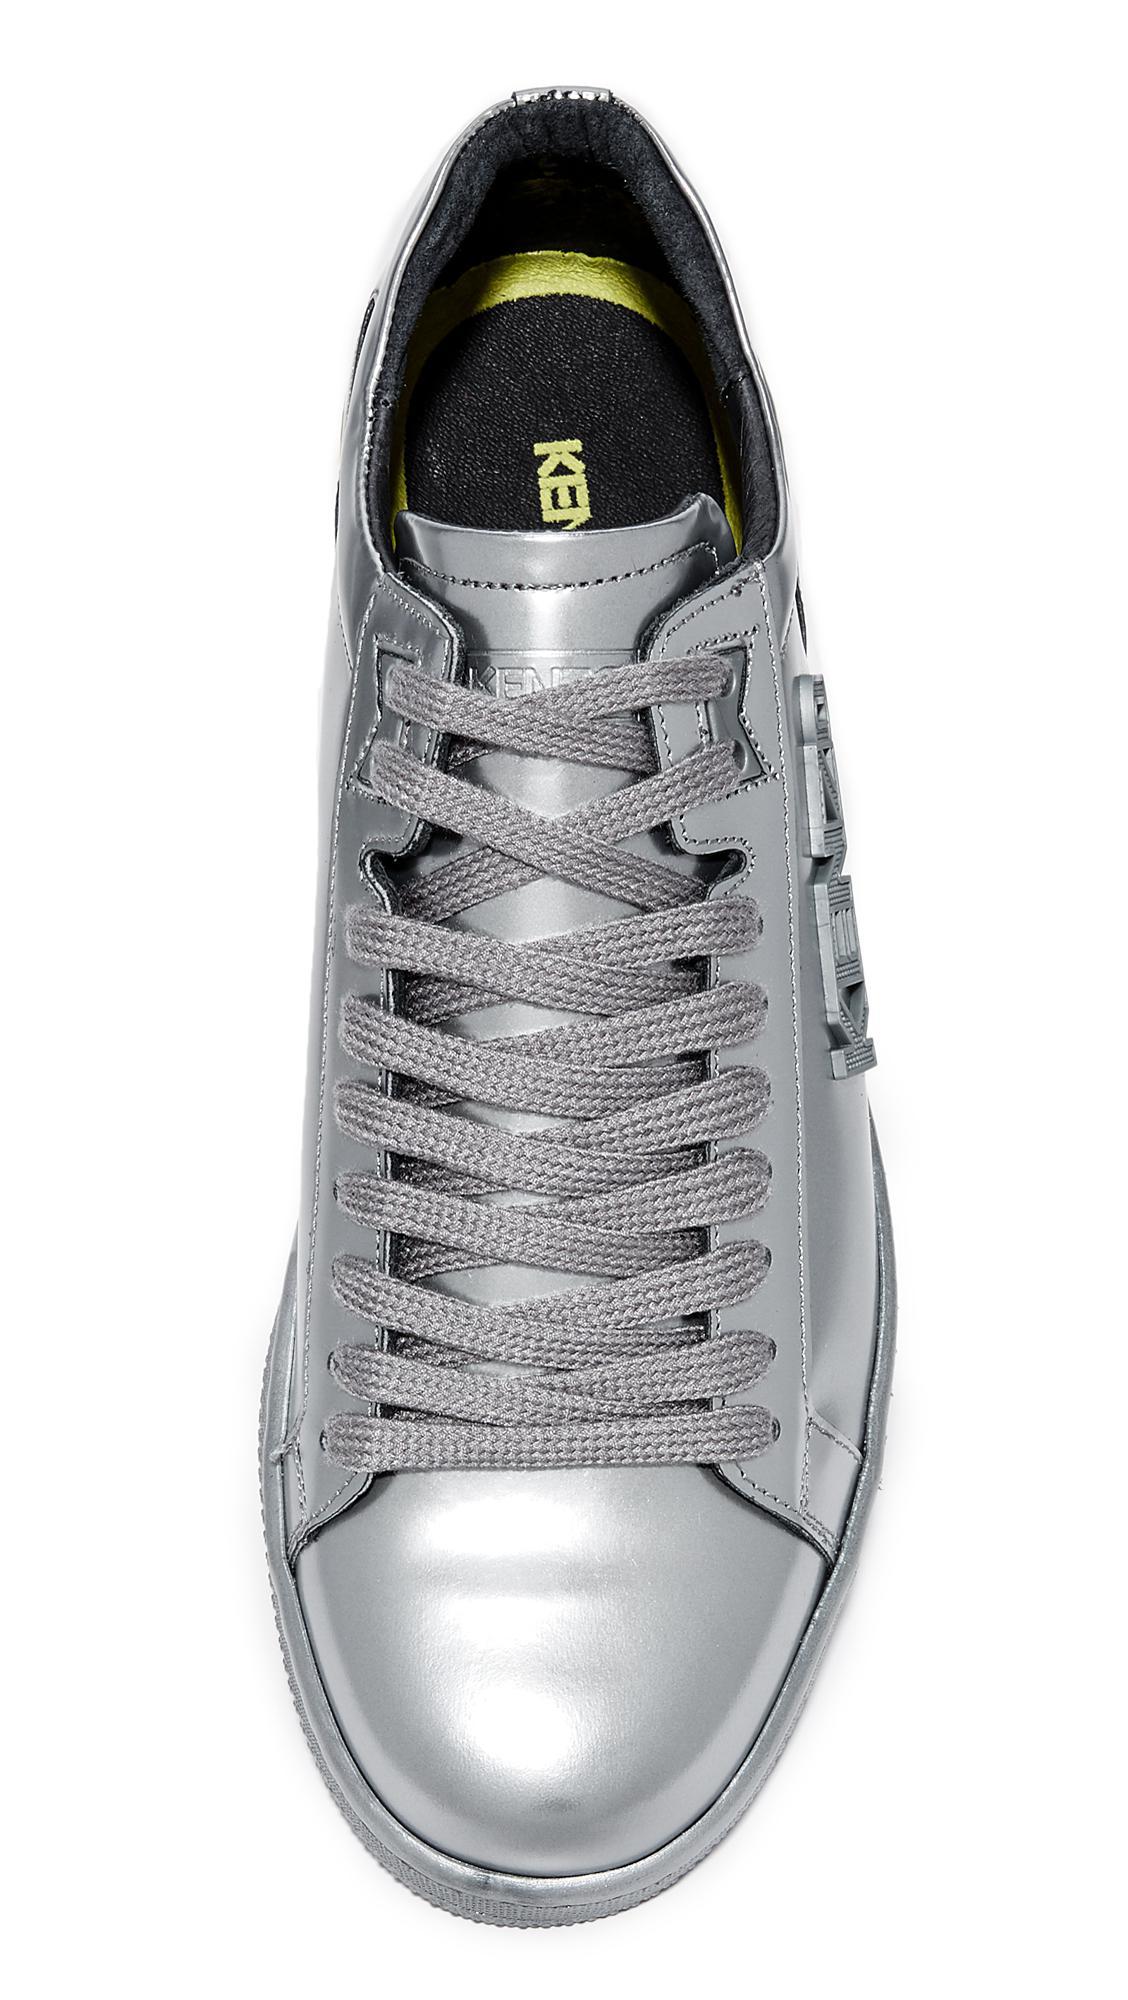 f8b9e313d7 Lyst - KENZO Tennix Metallic Lace Up Sneakers in Metallic for Men